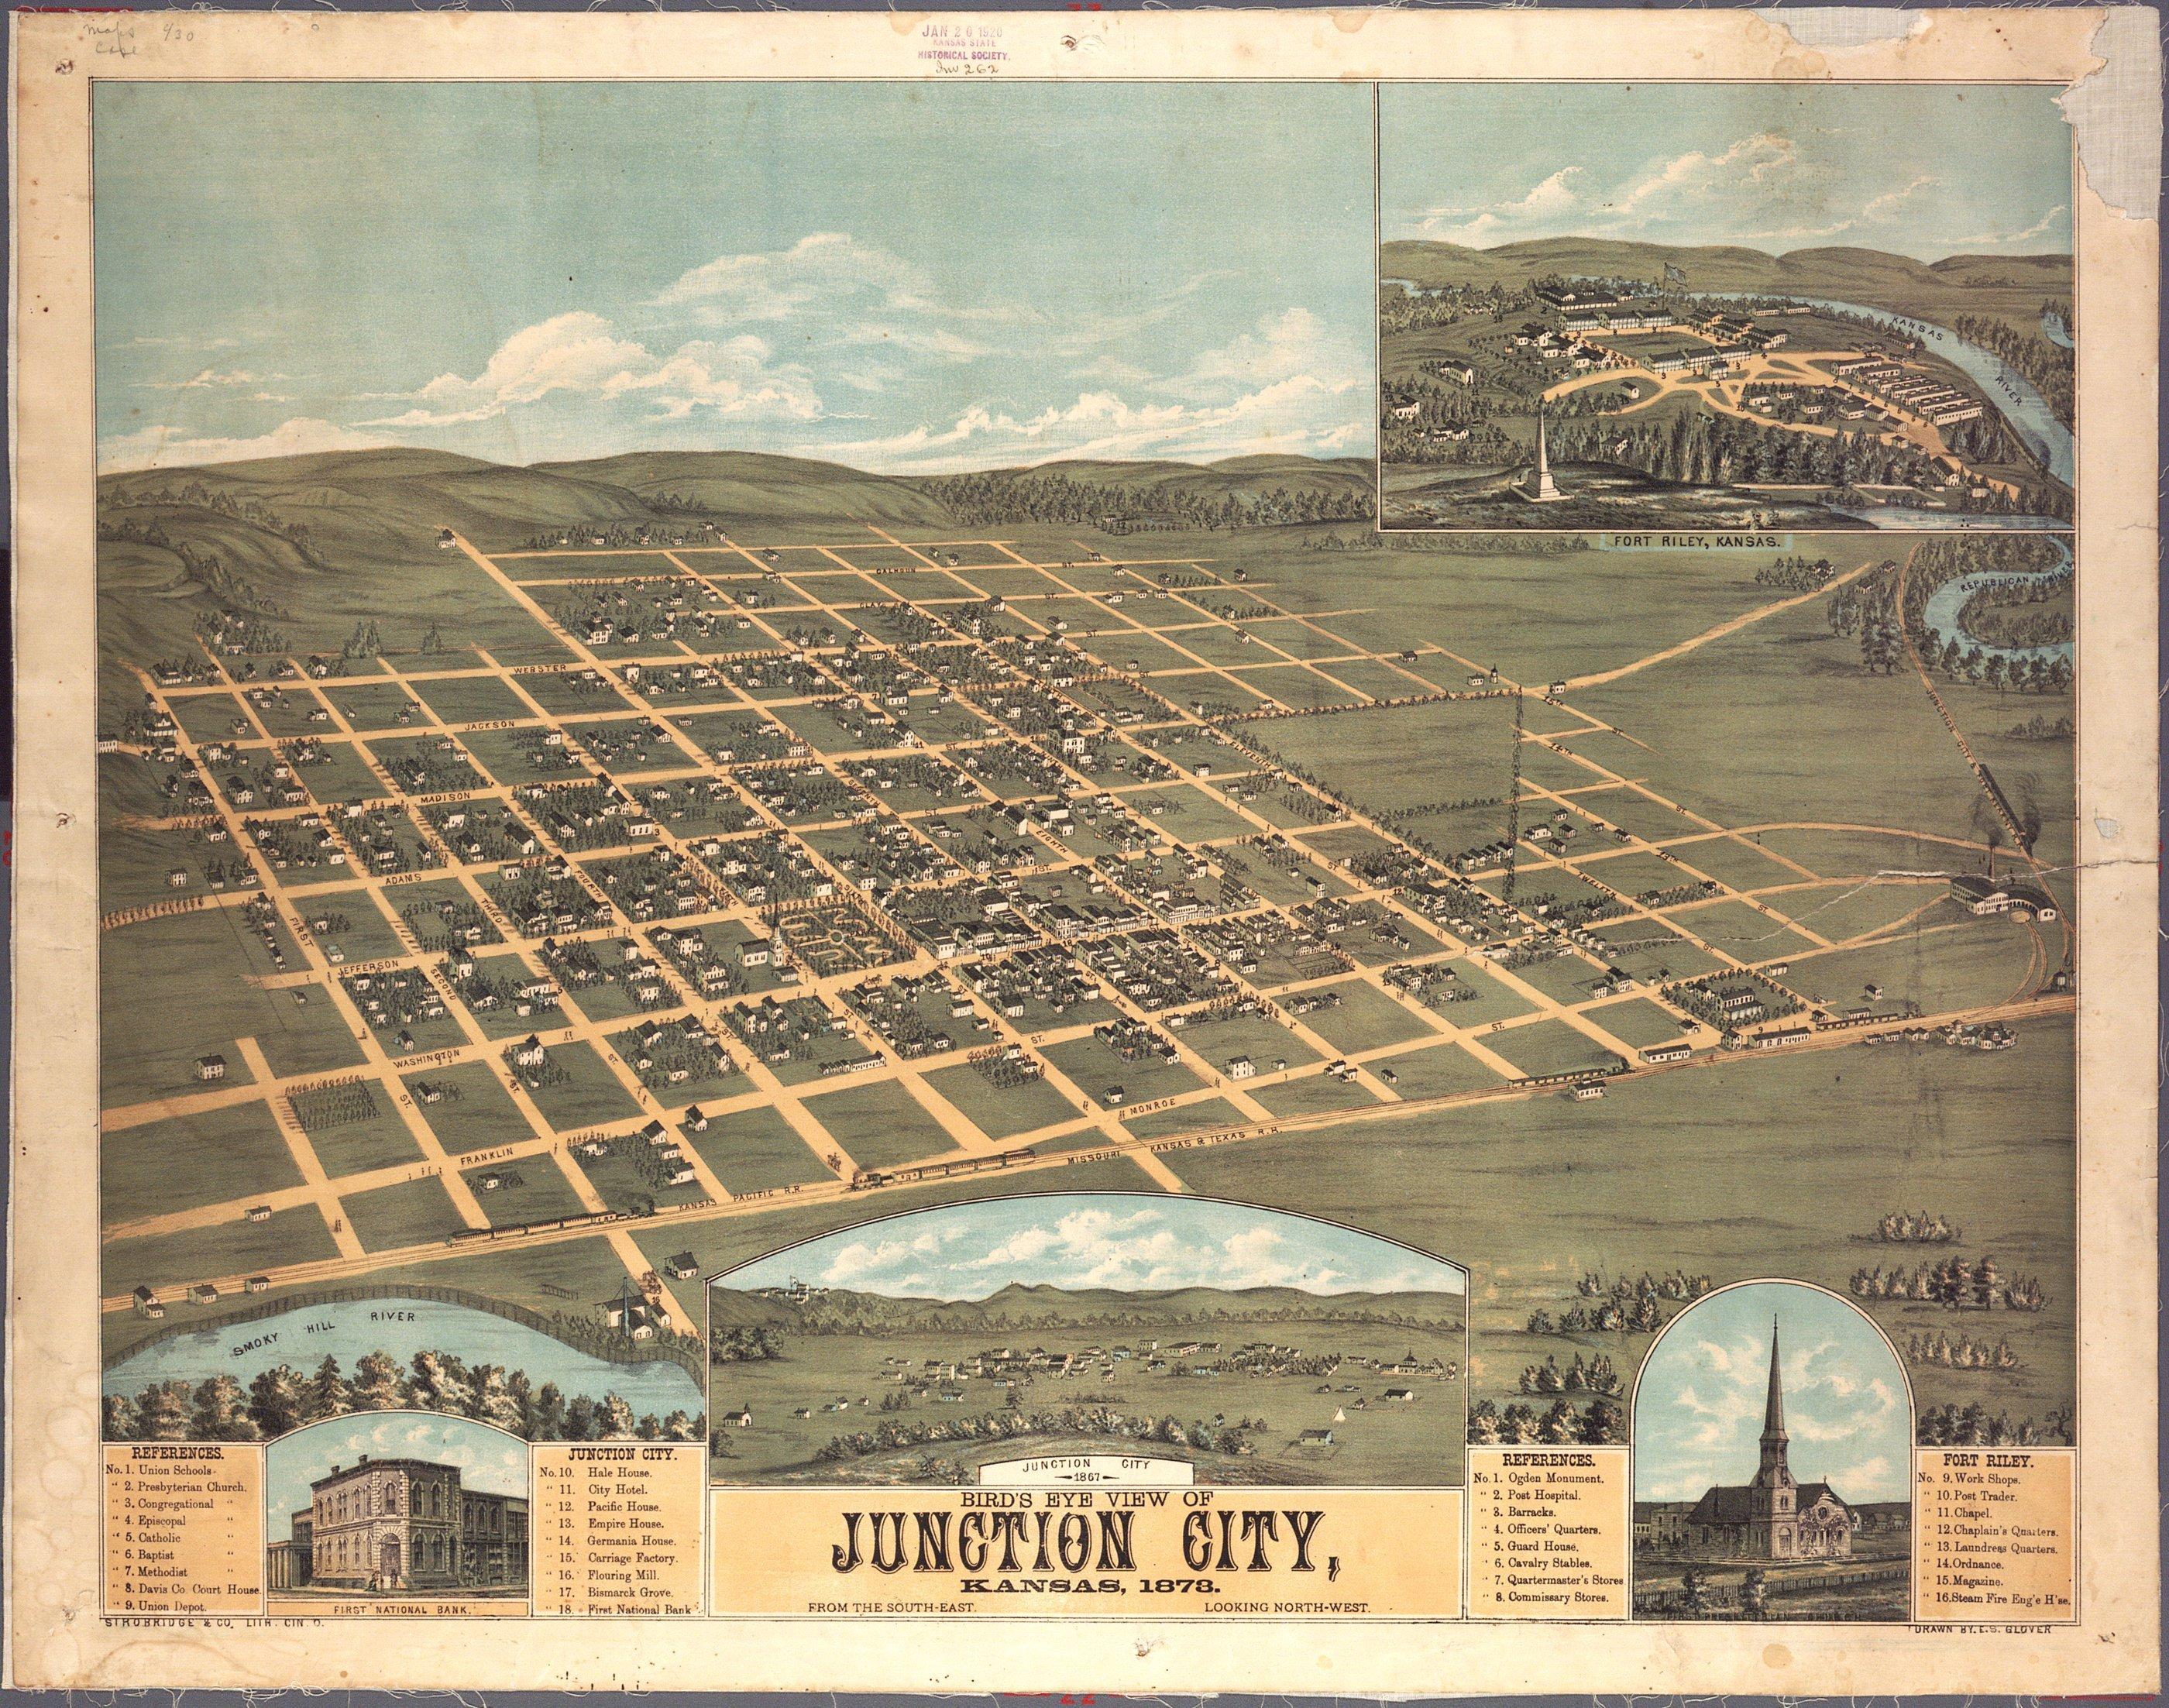 Bird's eye view of Junction City, Kansas